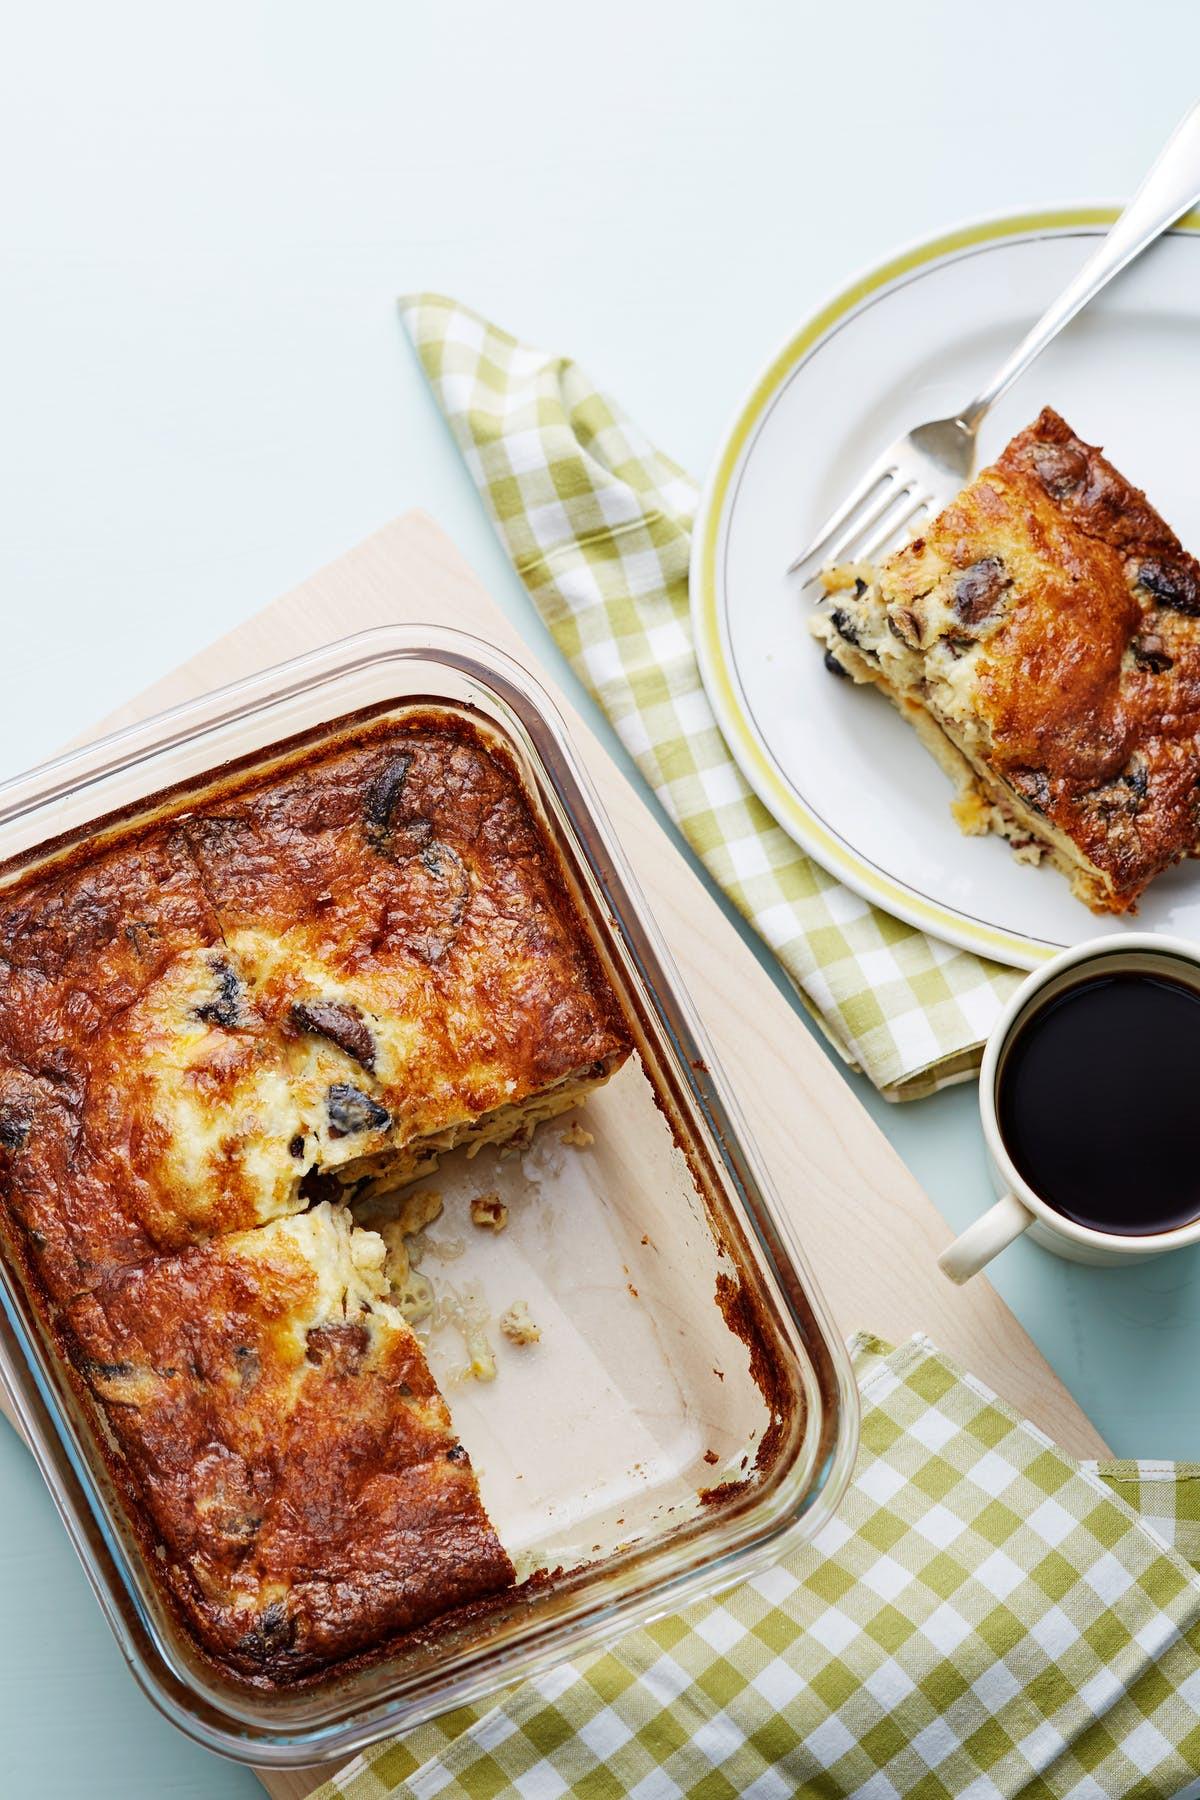 Keto Recipes For Breakfast  Keto Bacon and Mushroom Breakfast Casserole Diet Doctor